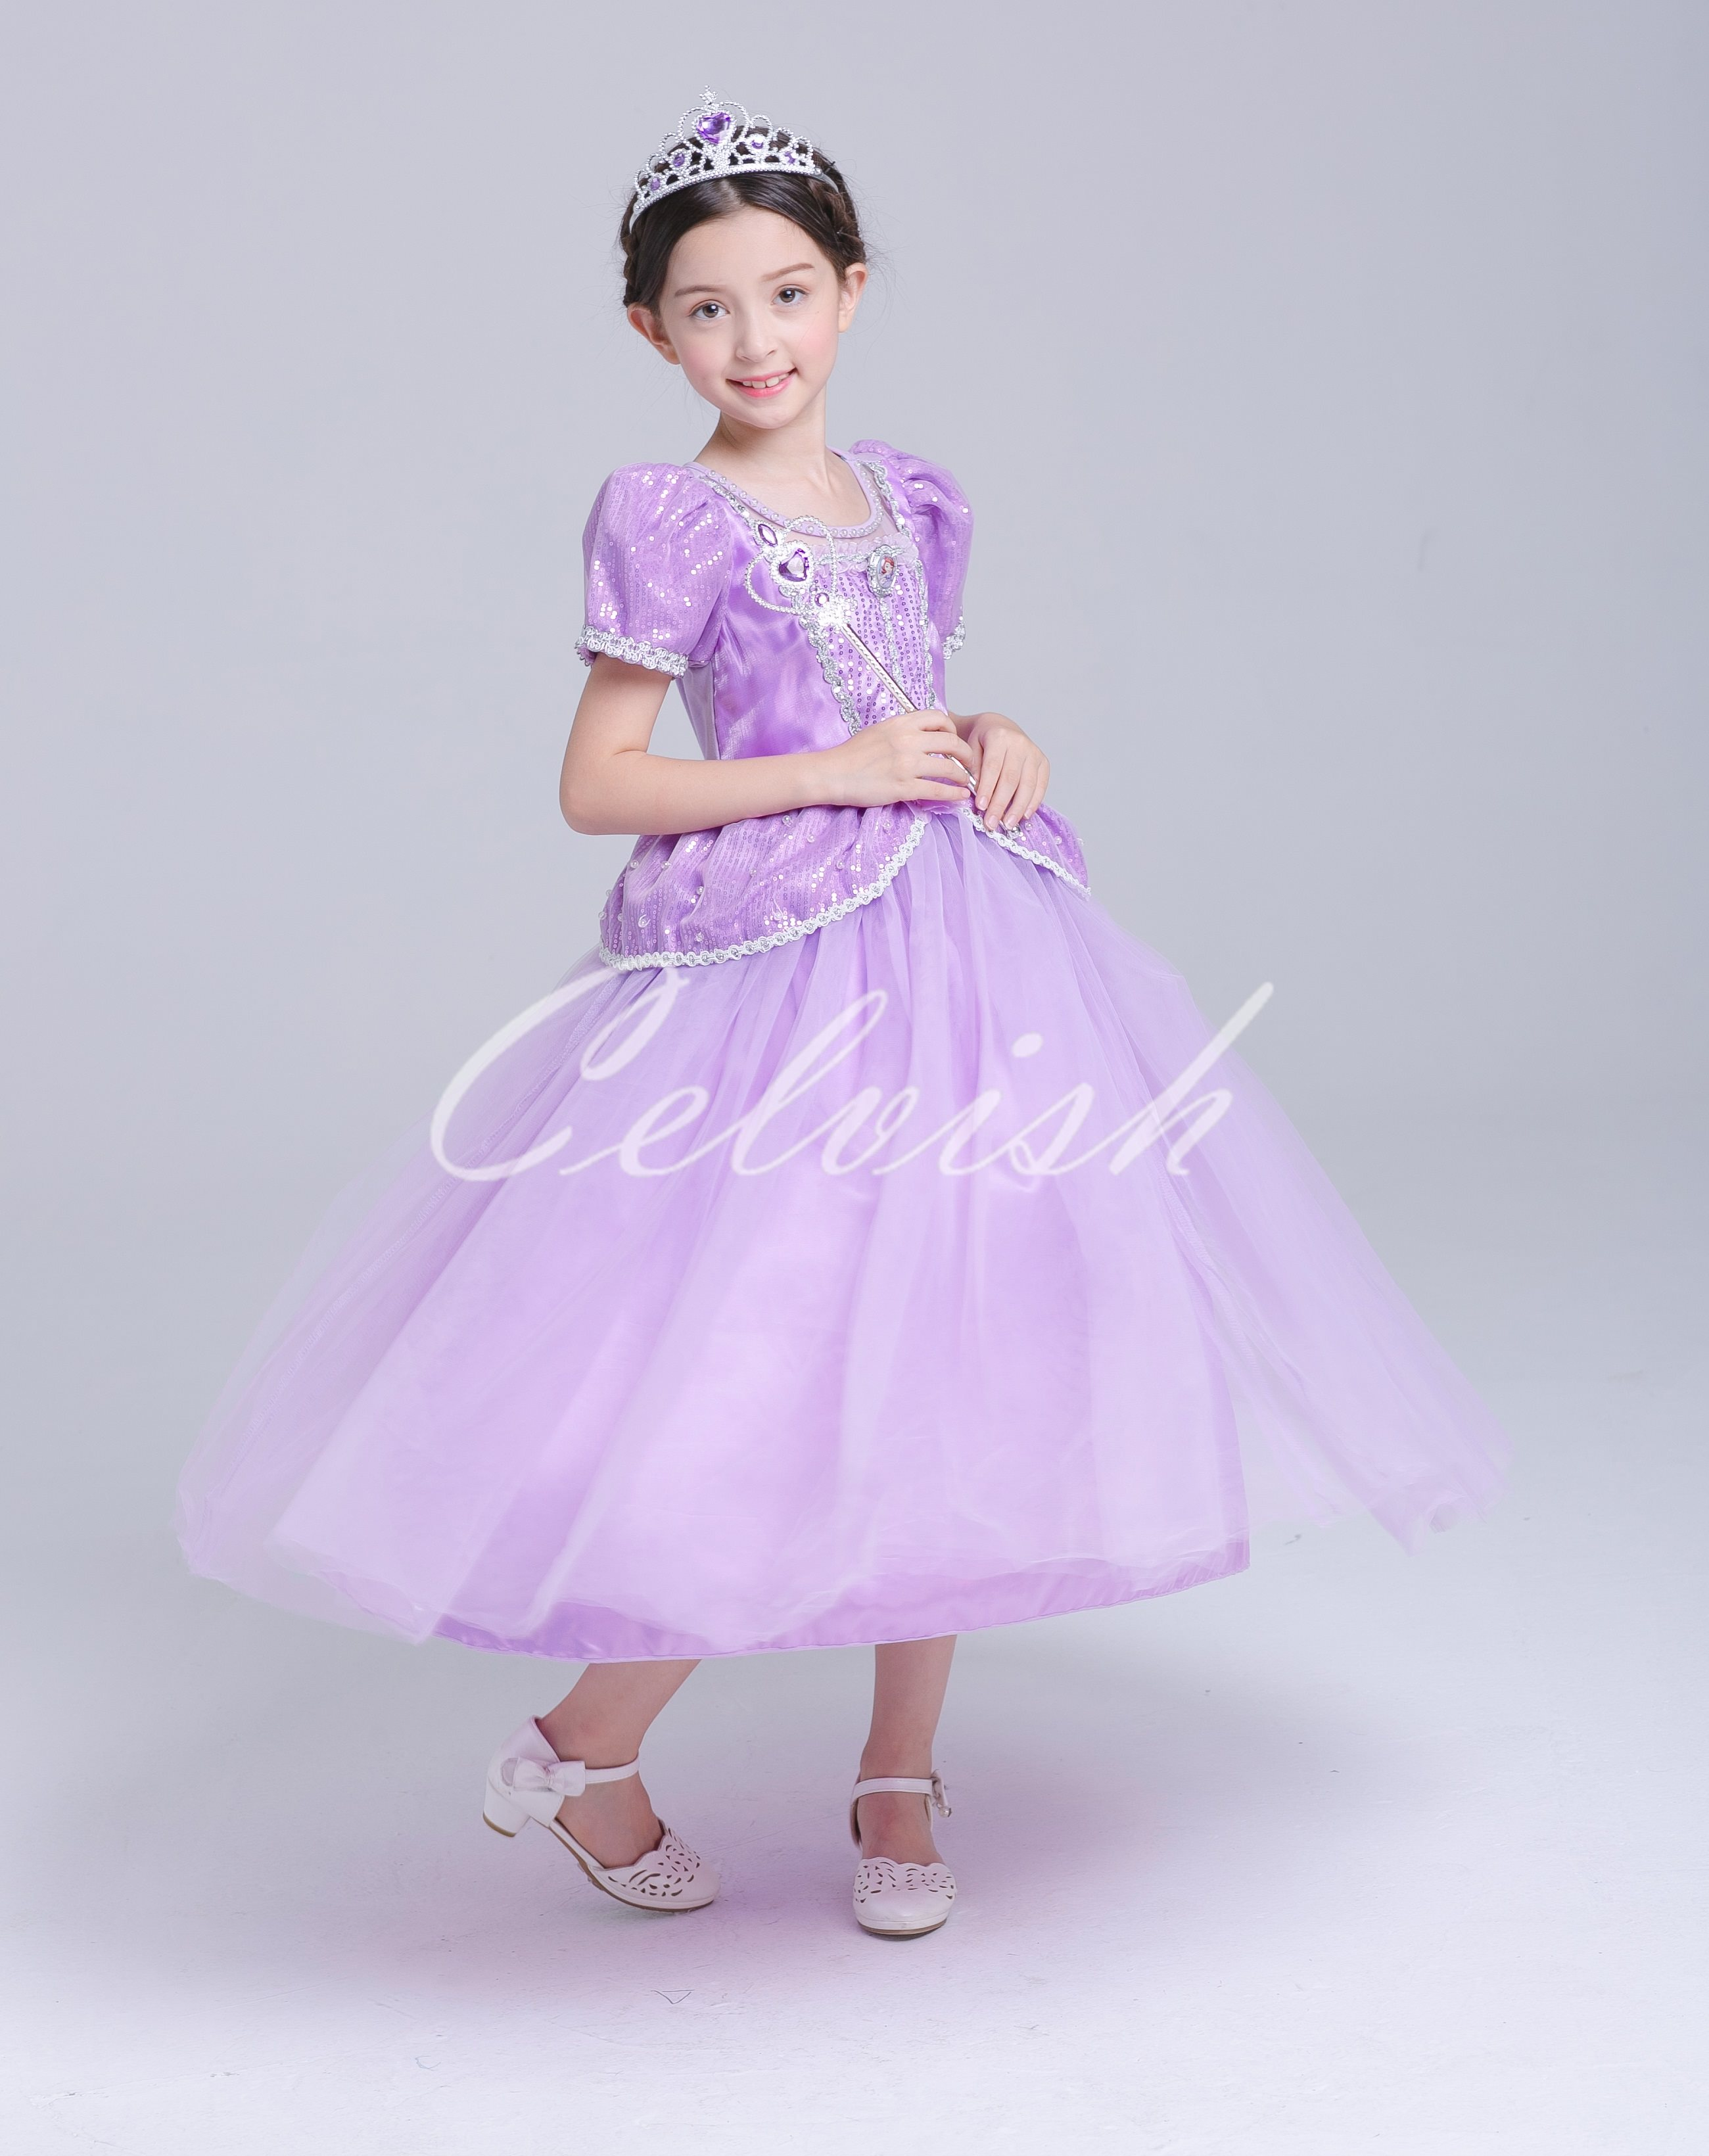 a4c2c199ccdbd ディズニーコスプレドレスソフィア風プリンセスドレス子供ドレス衣装USJC-2958S7293